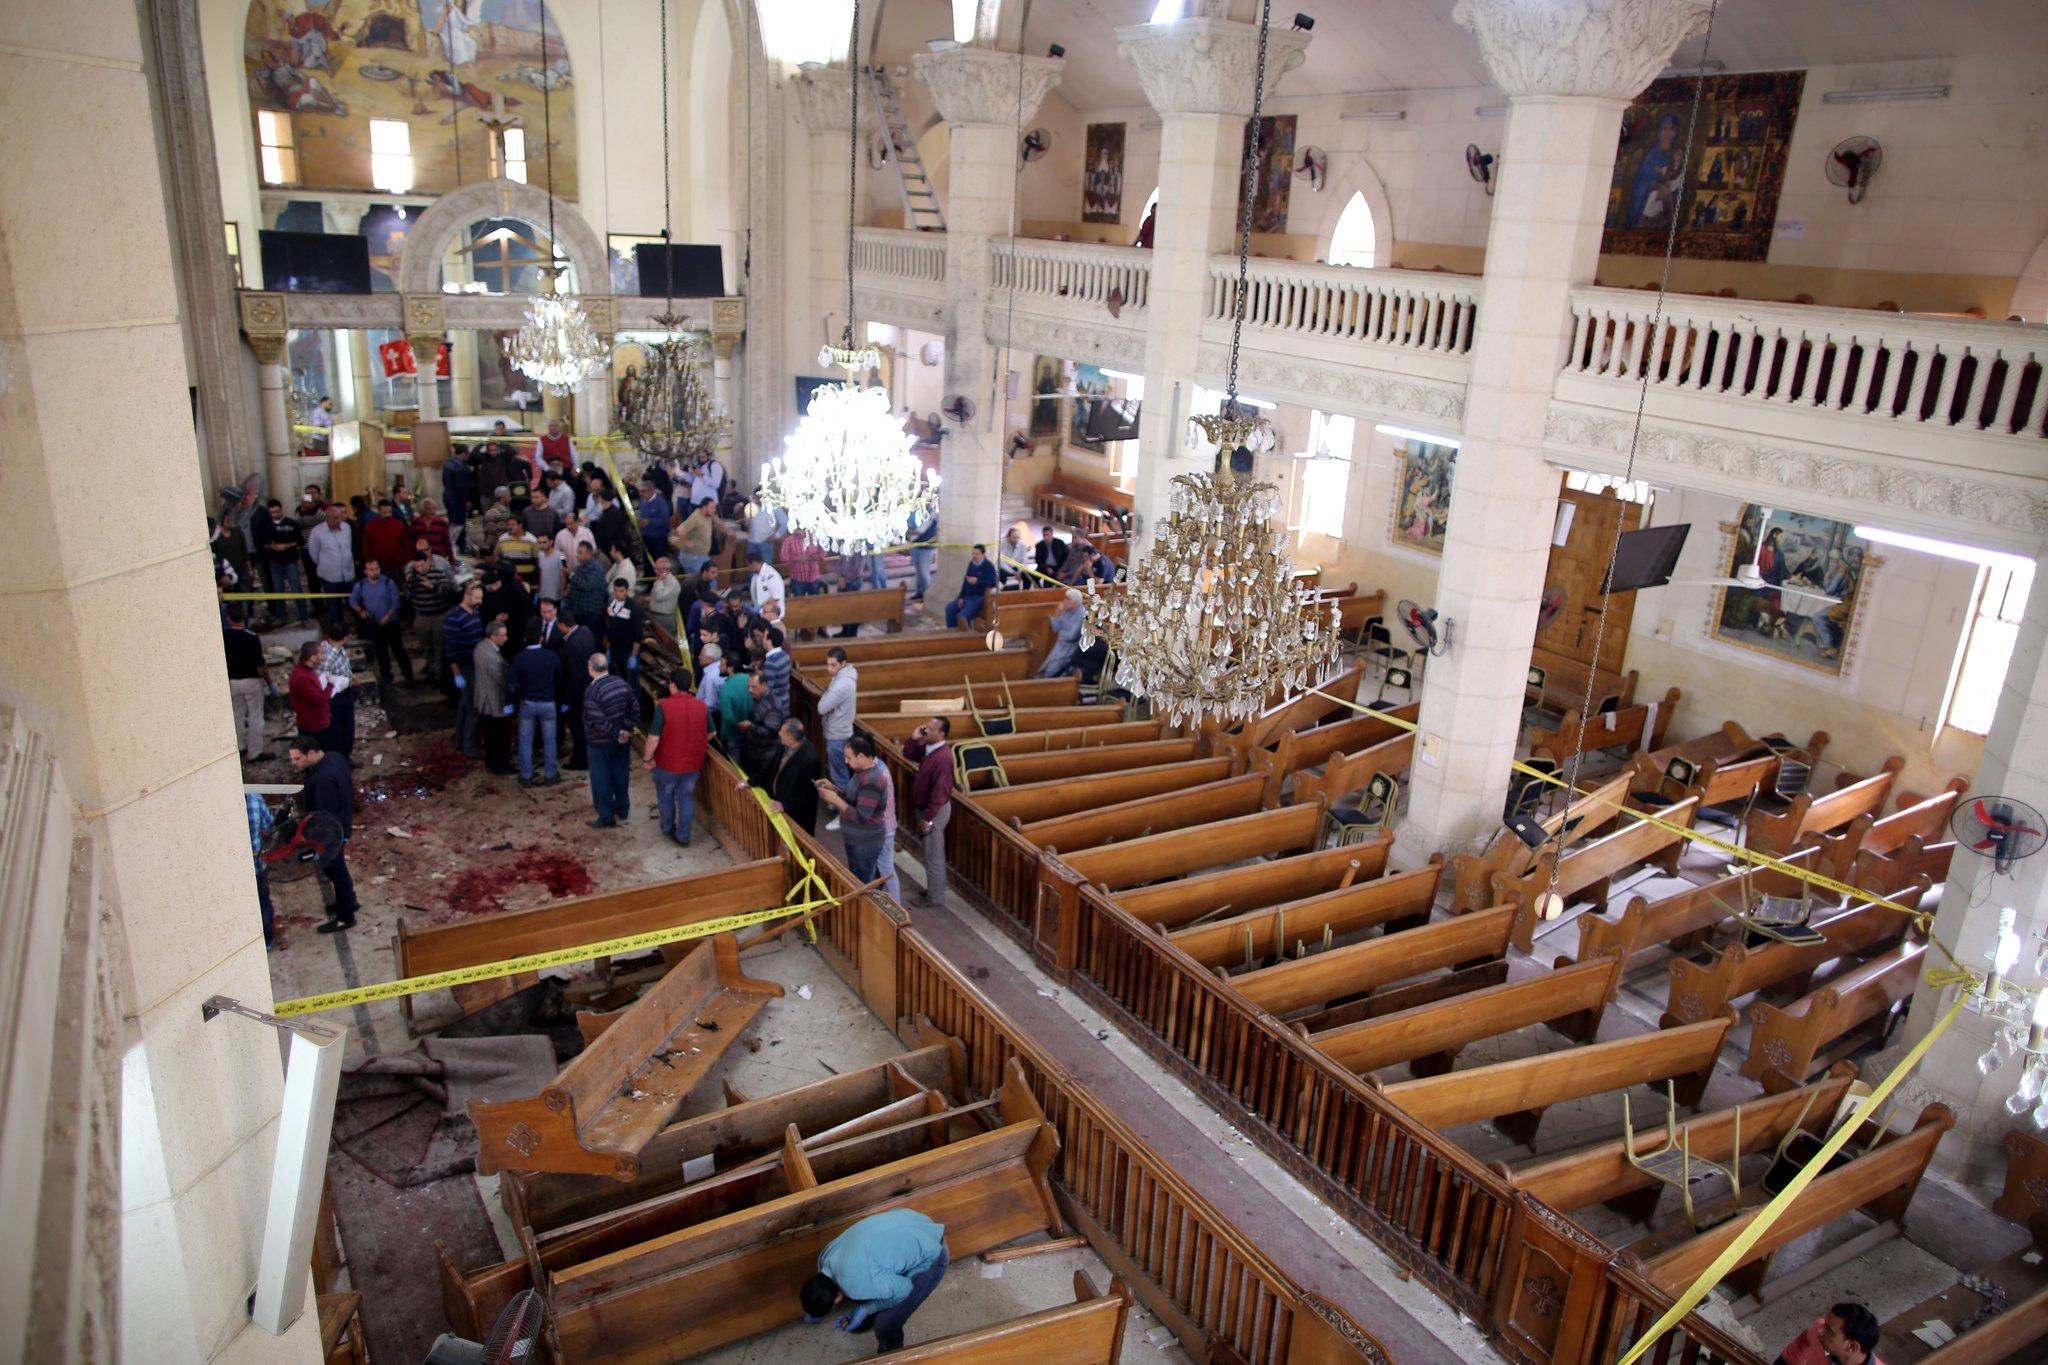 Explosions hit Coptic churches